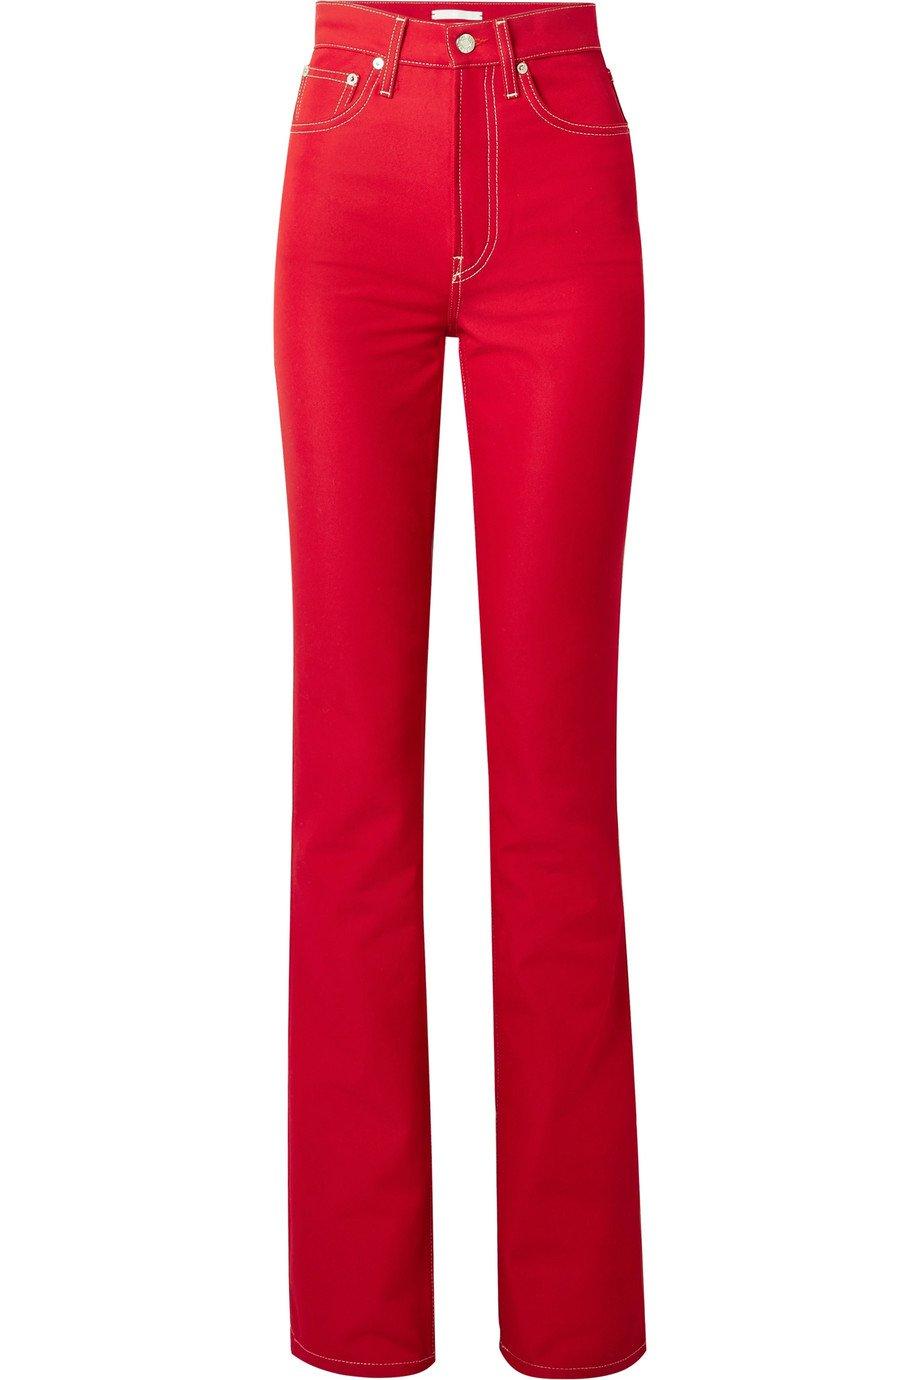 Helmut Lang   High-rise slim-leg jeans   NET-A-PORTER.COM